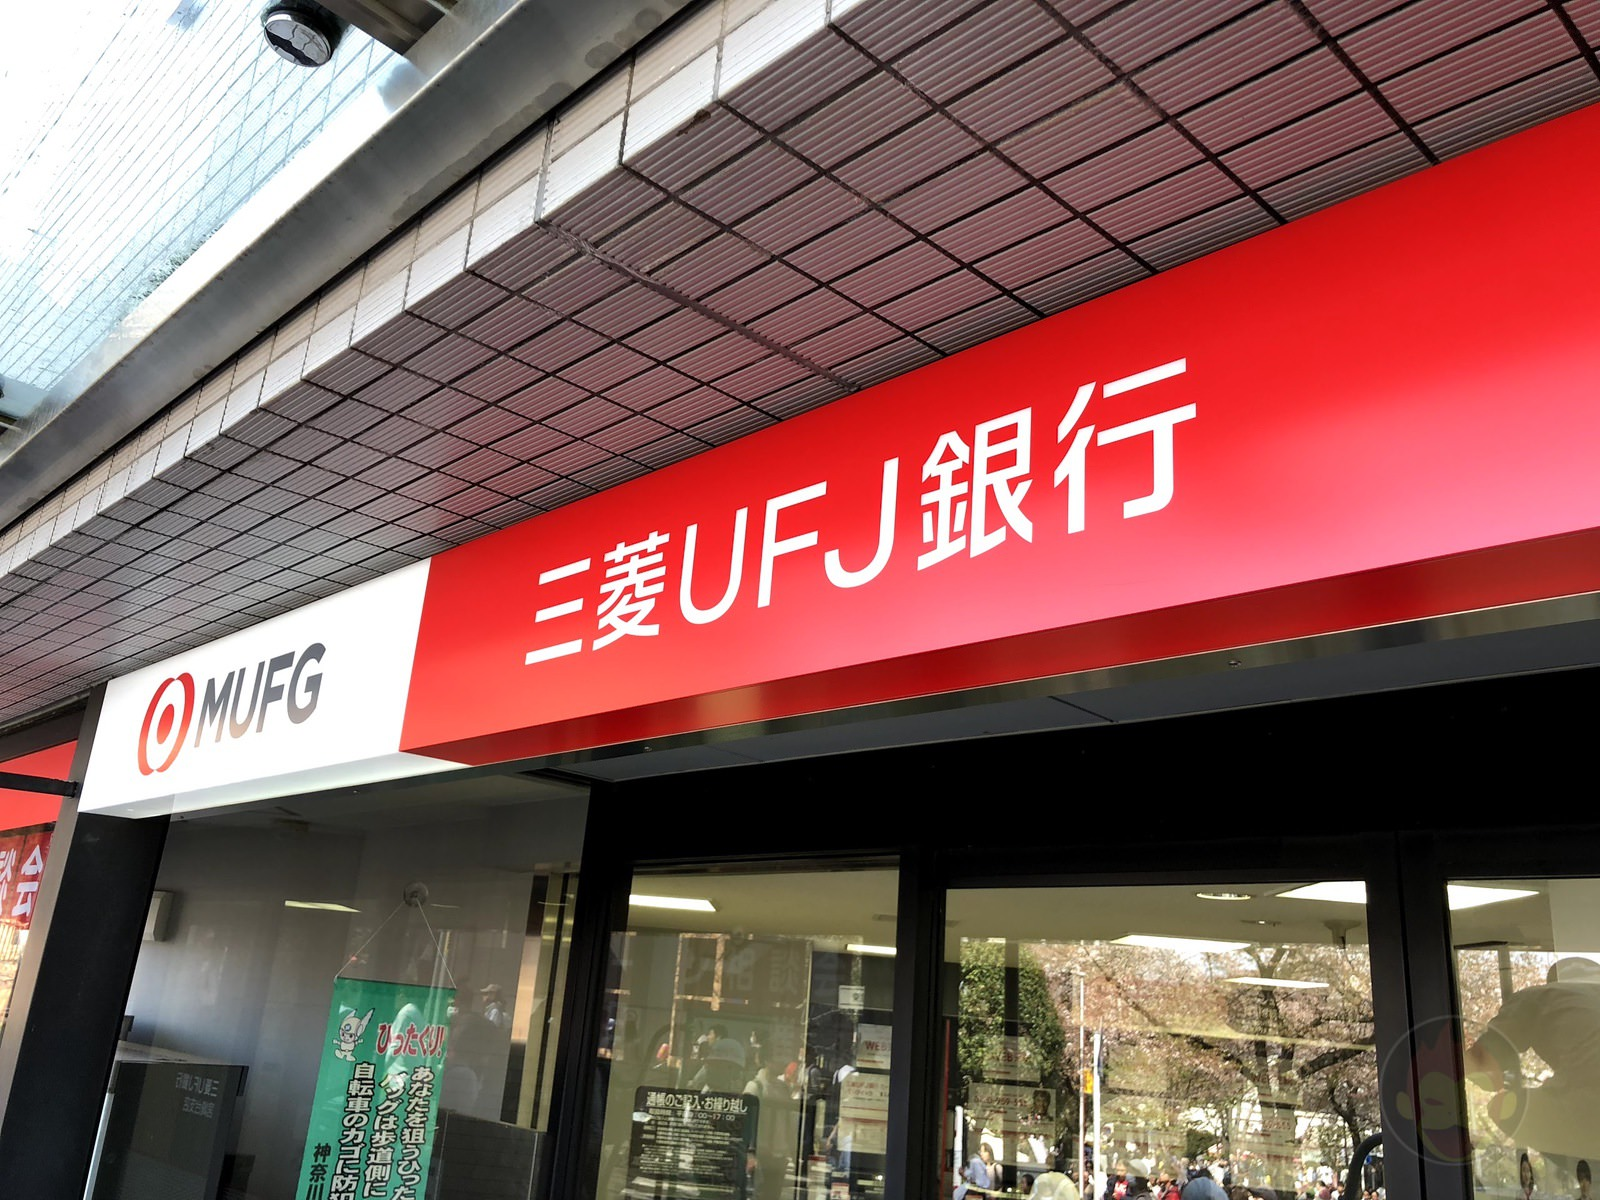 Mitsubishi UFJ Bank 01